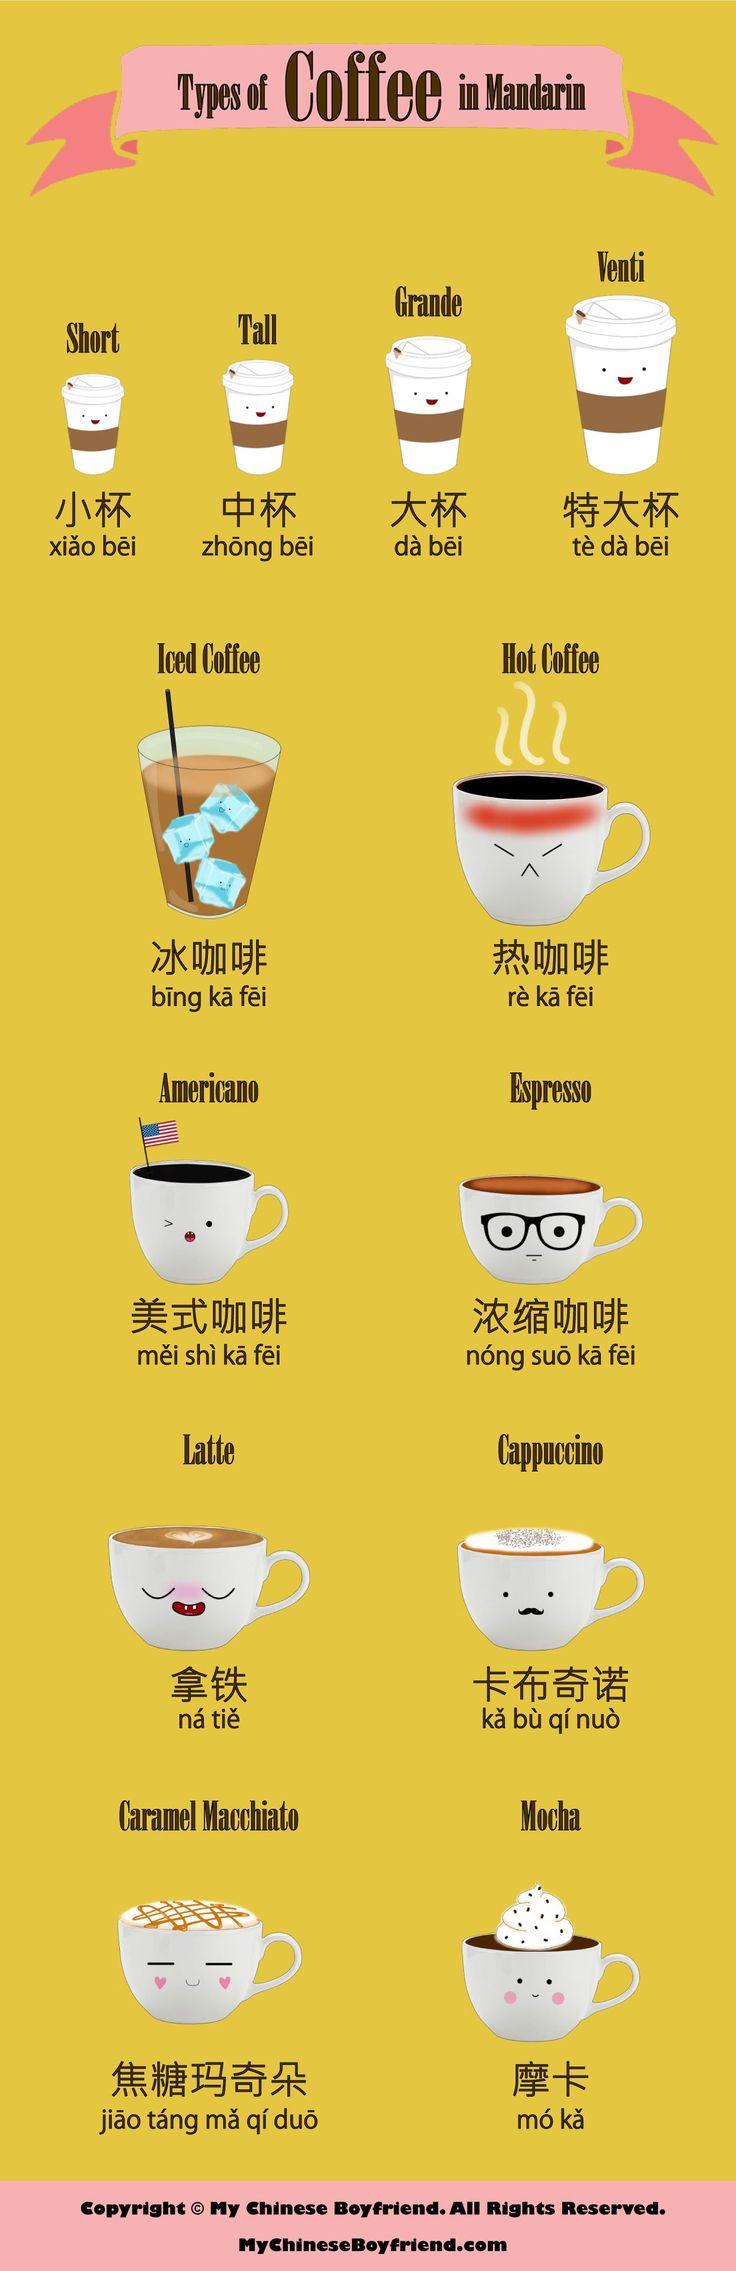 Essential vocabulary words for hotel housekeeping fluentu english - Mychinesebf_mandrincoffee